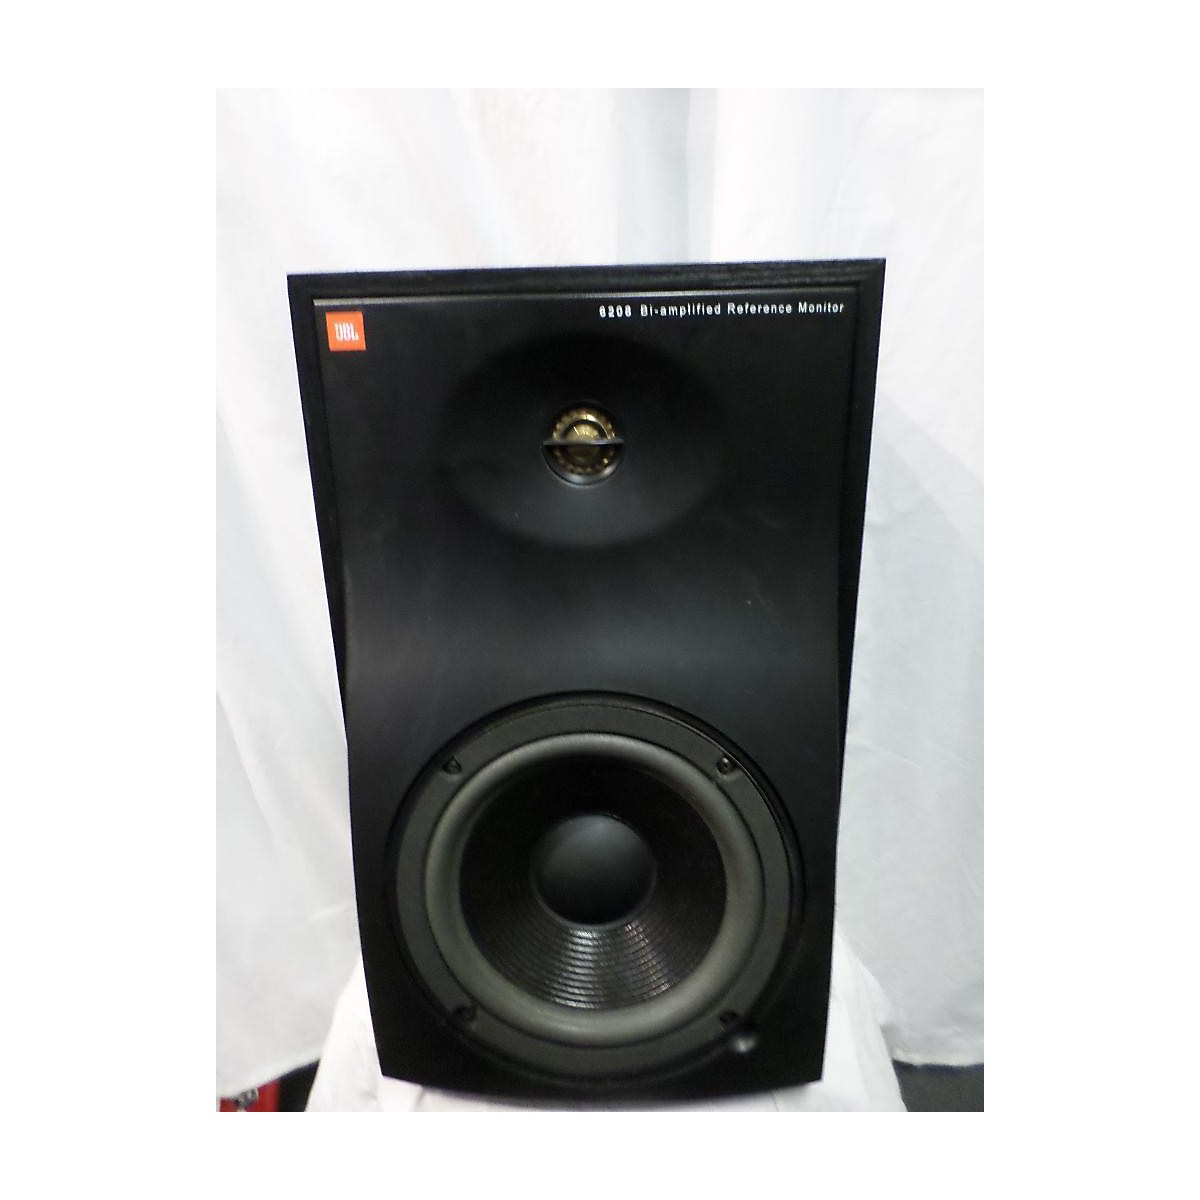 JBL 6208 Bi-Amplifier Powered Monitor